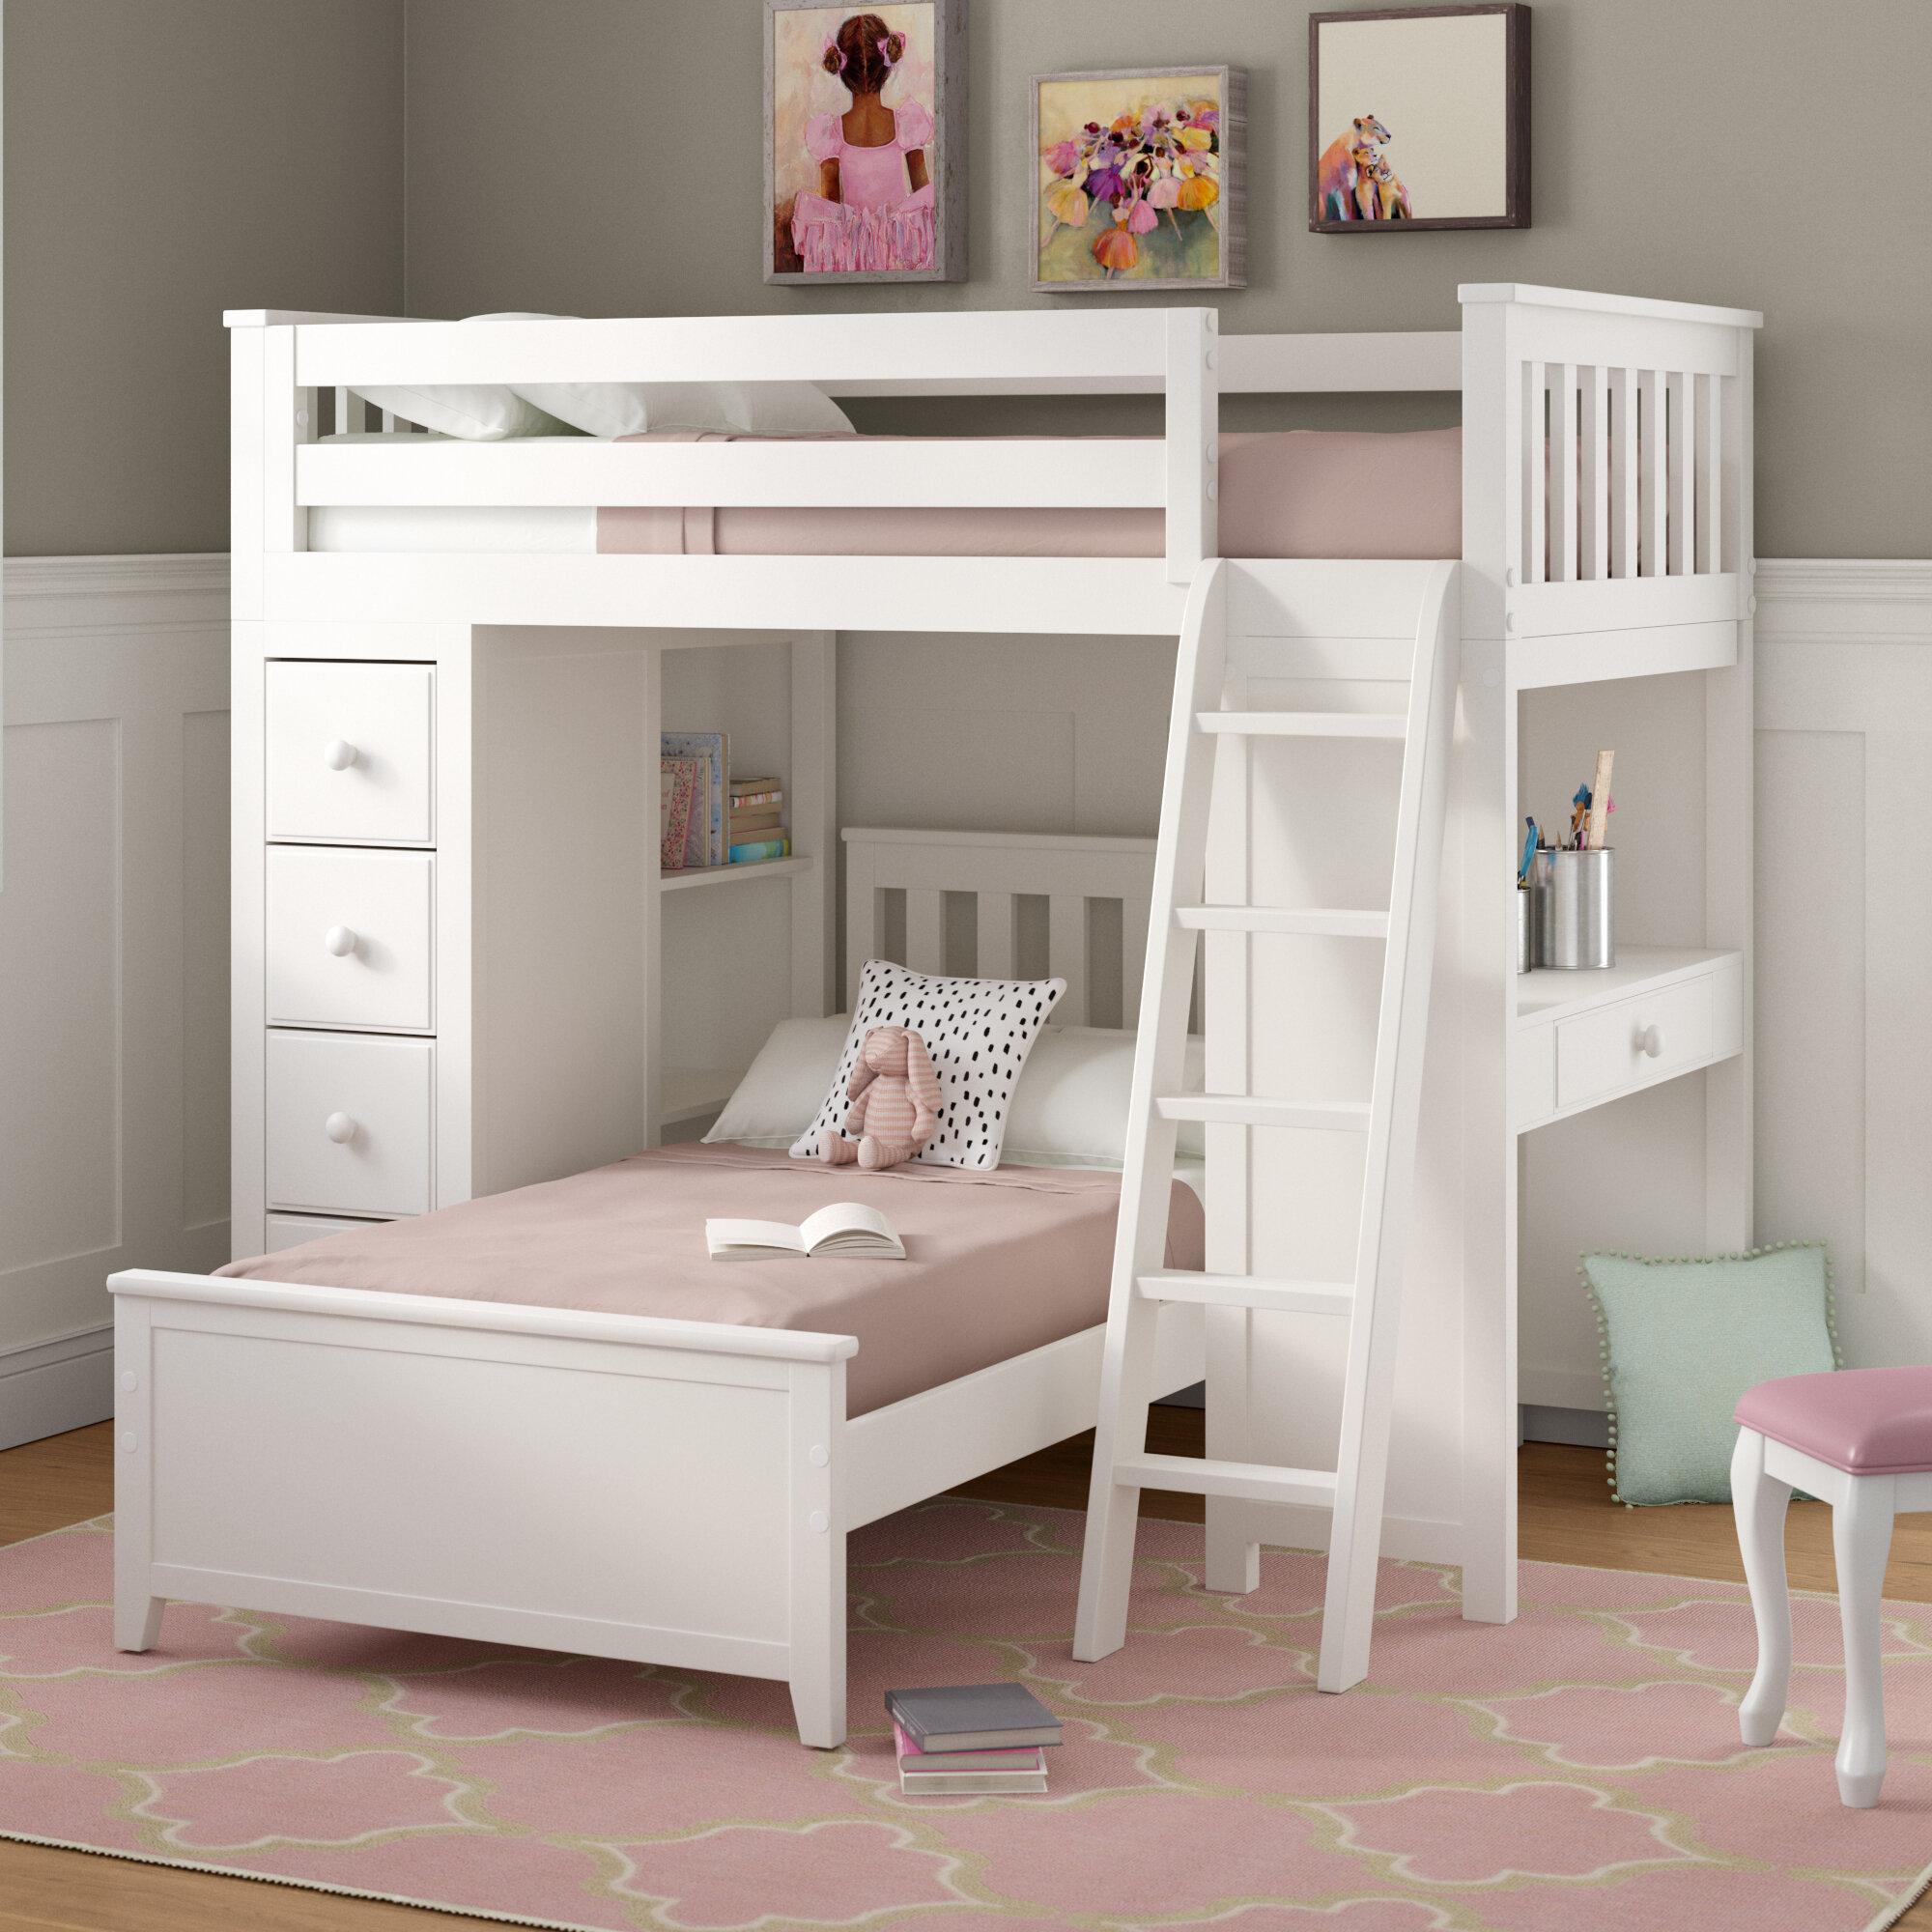 Charmant Bunk Bed Desk Dresser Combo | Wayfair